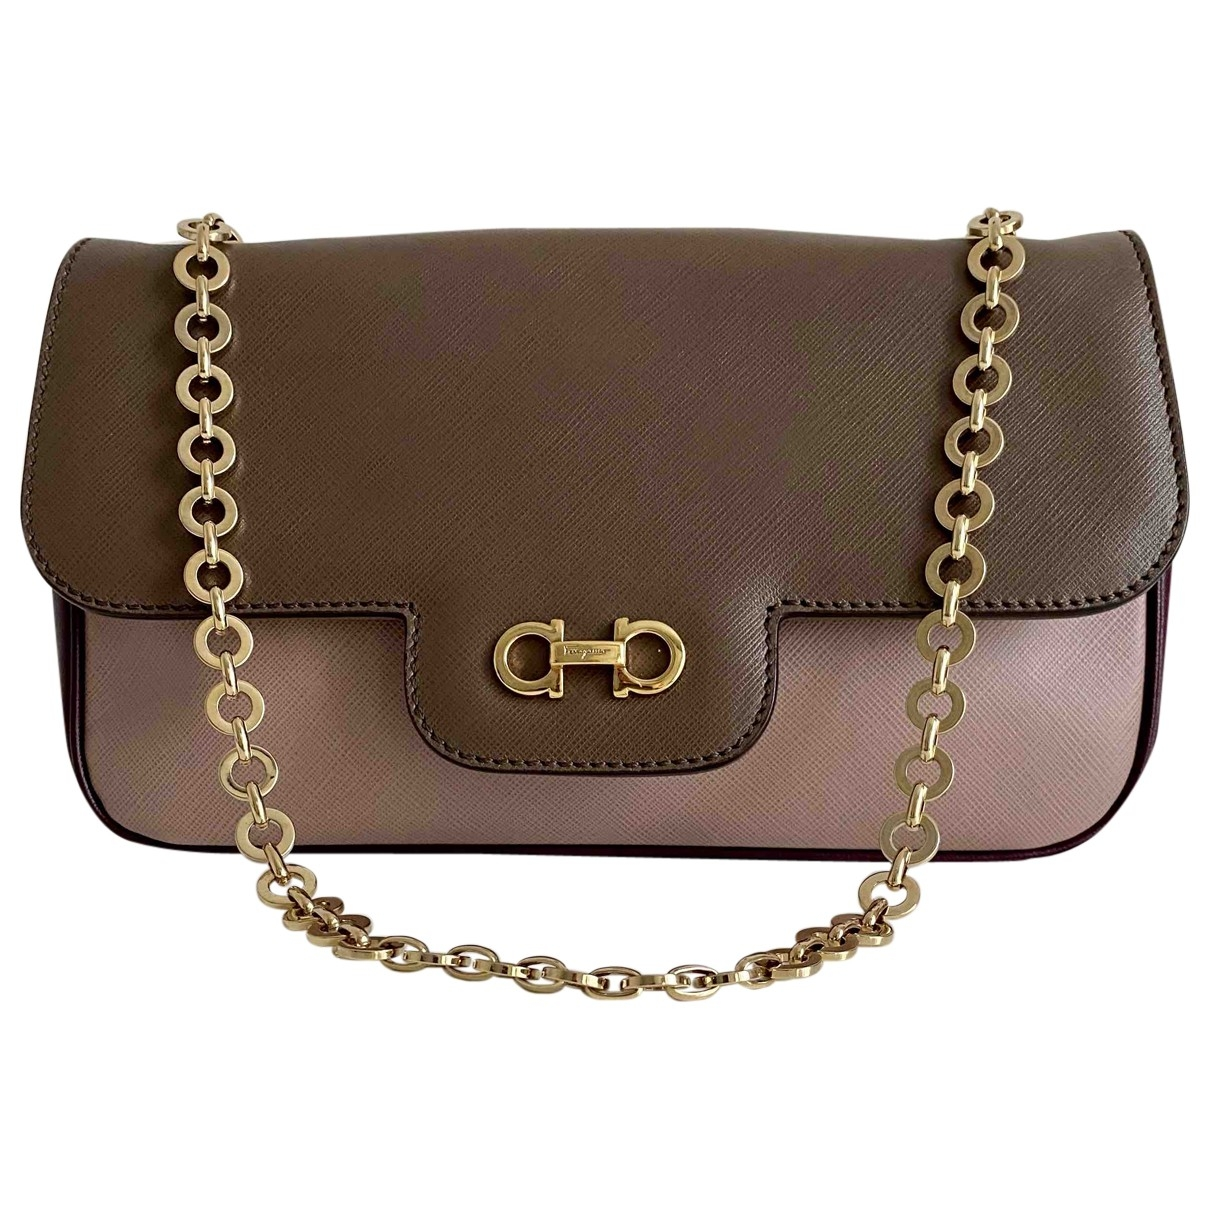 Salvatore Ferragamo \N Multicolour Leather handbag for Women \N